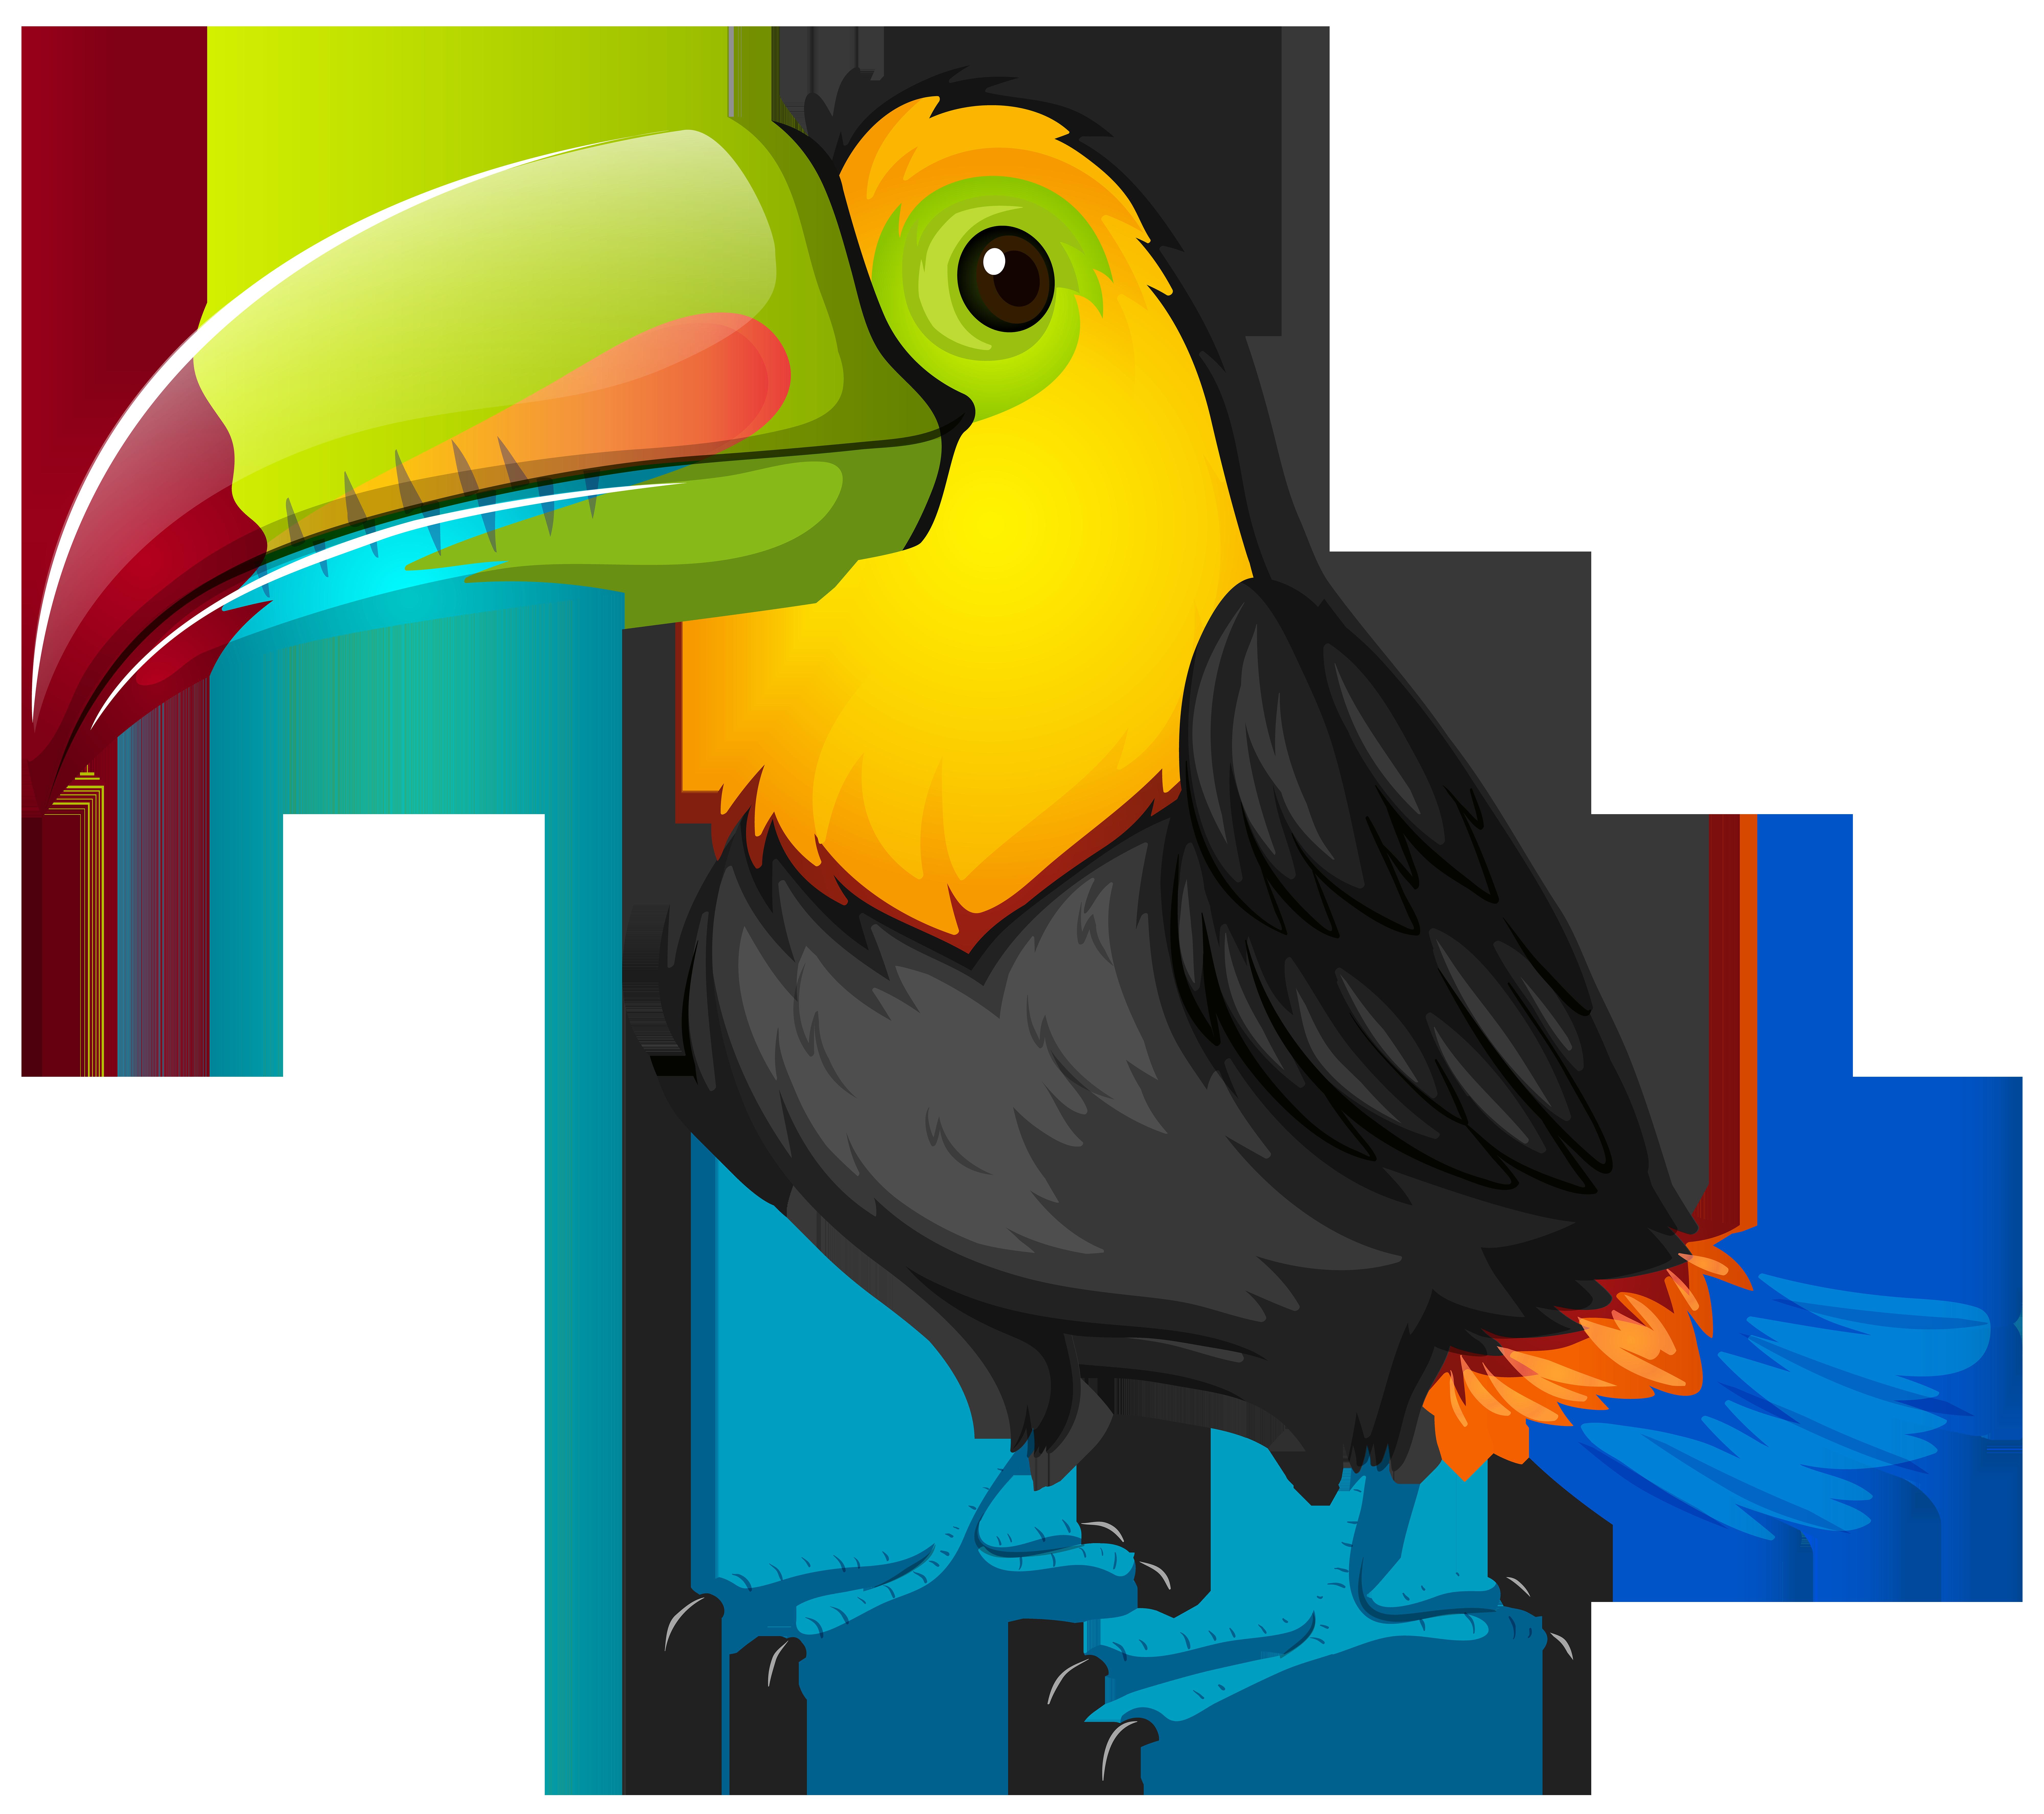 clip art royalty free download Bird Toucan Parrot Cartoon